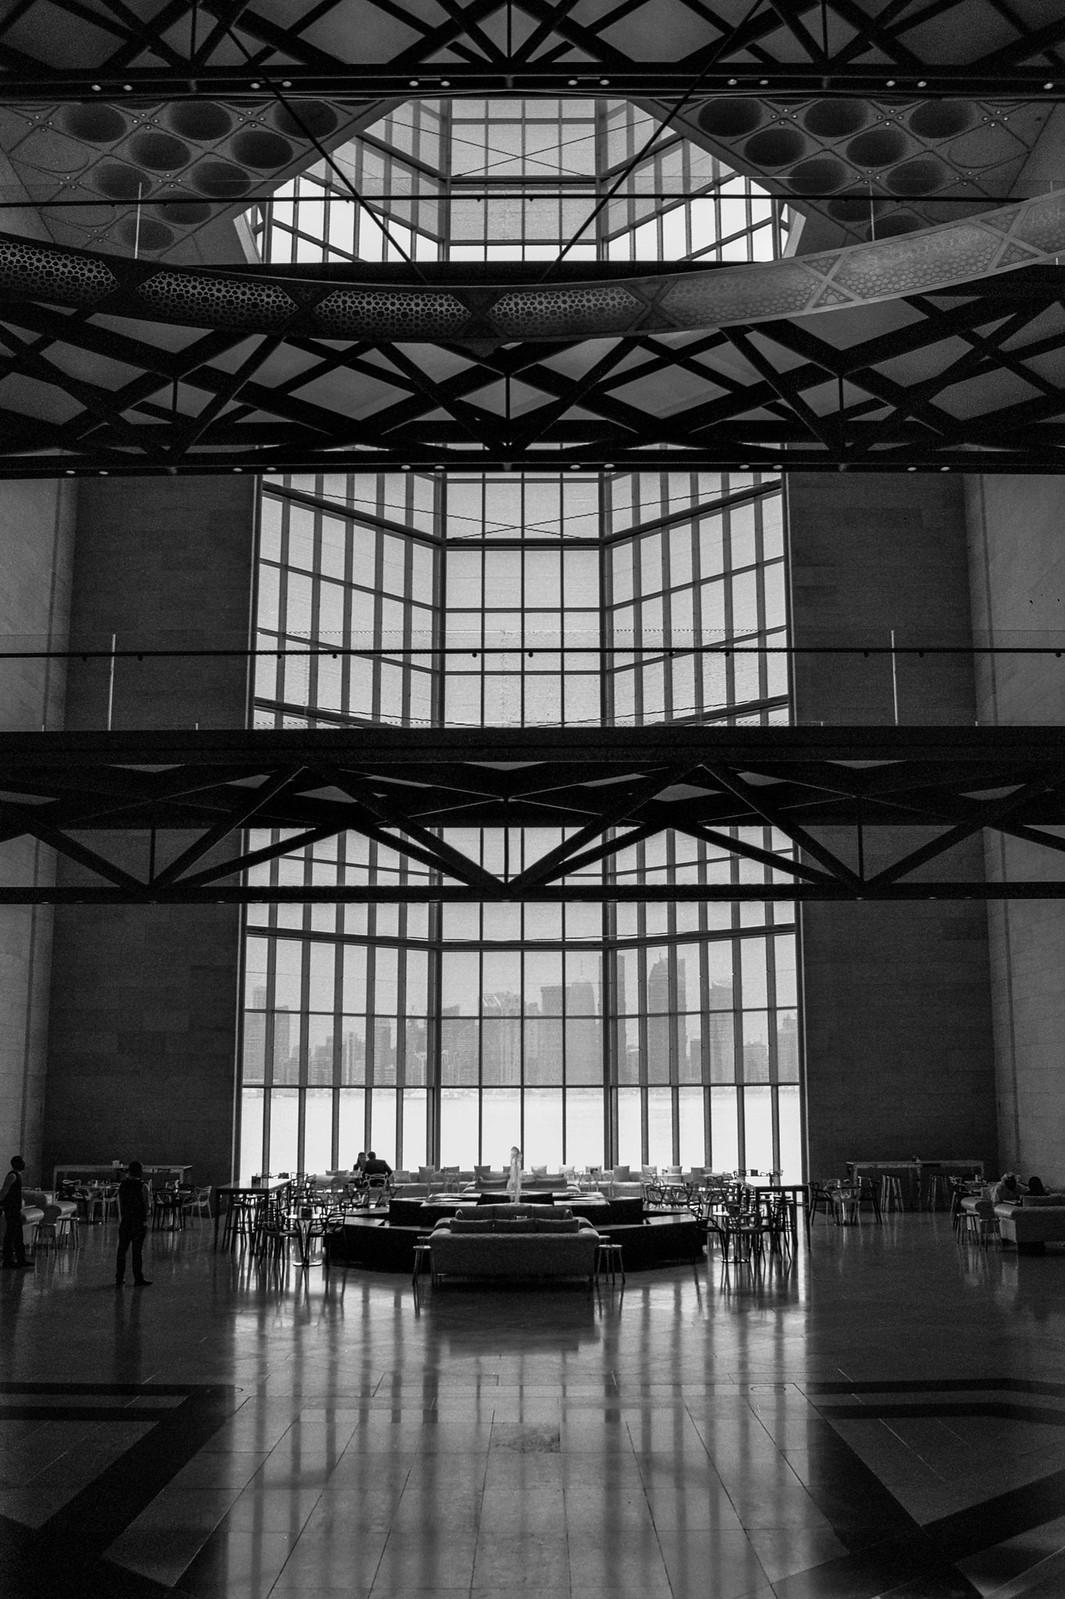 Café, Museum of Islamic Art, Doha